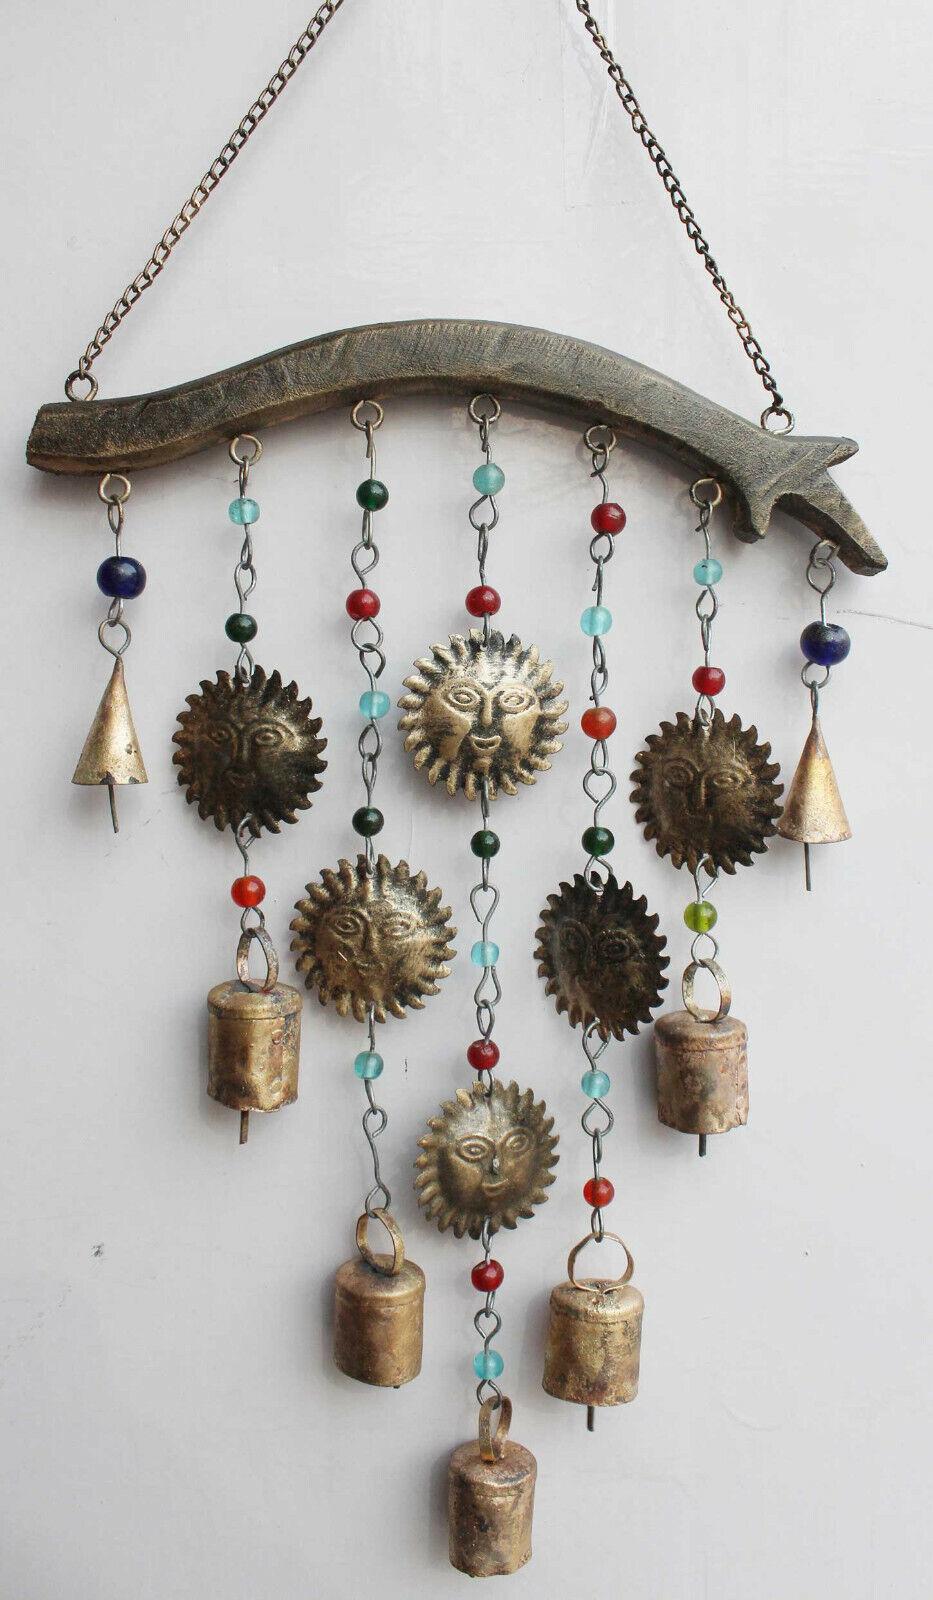 Recycled Iron Bells Boho Hanging Windchime Beads & Bells Suncatcher Patio Decor